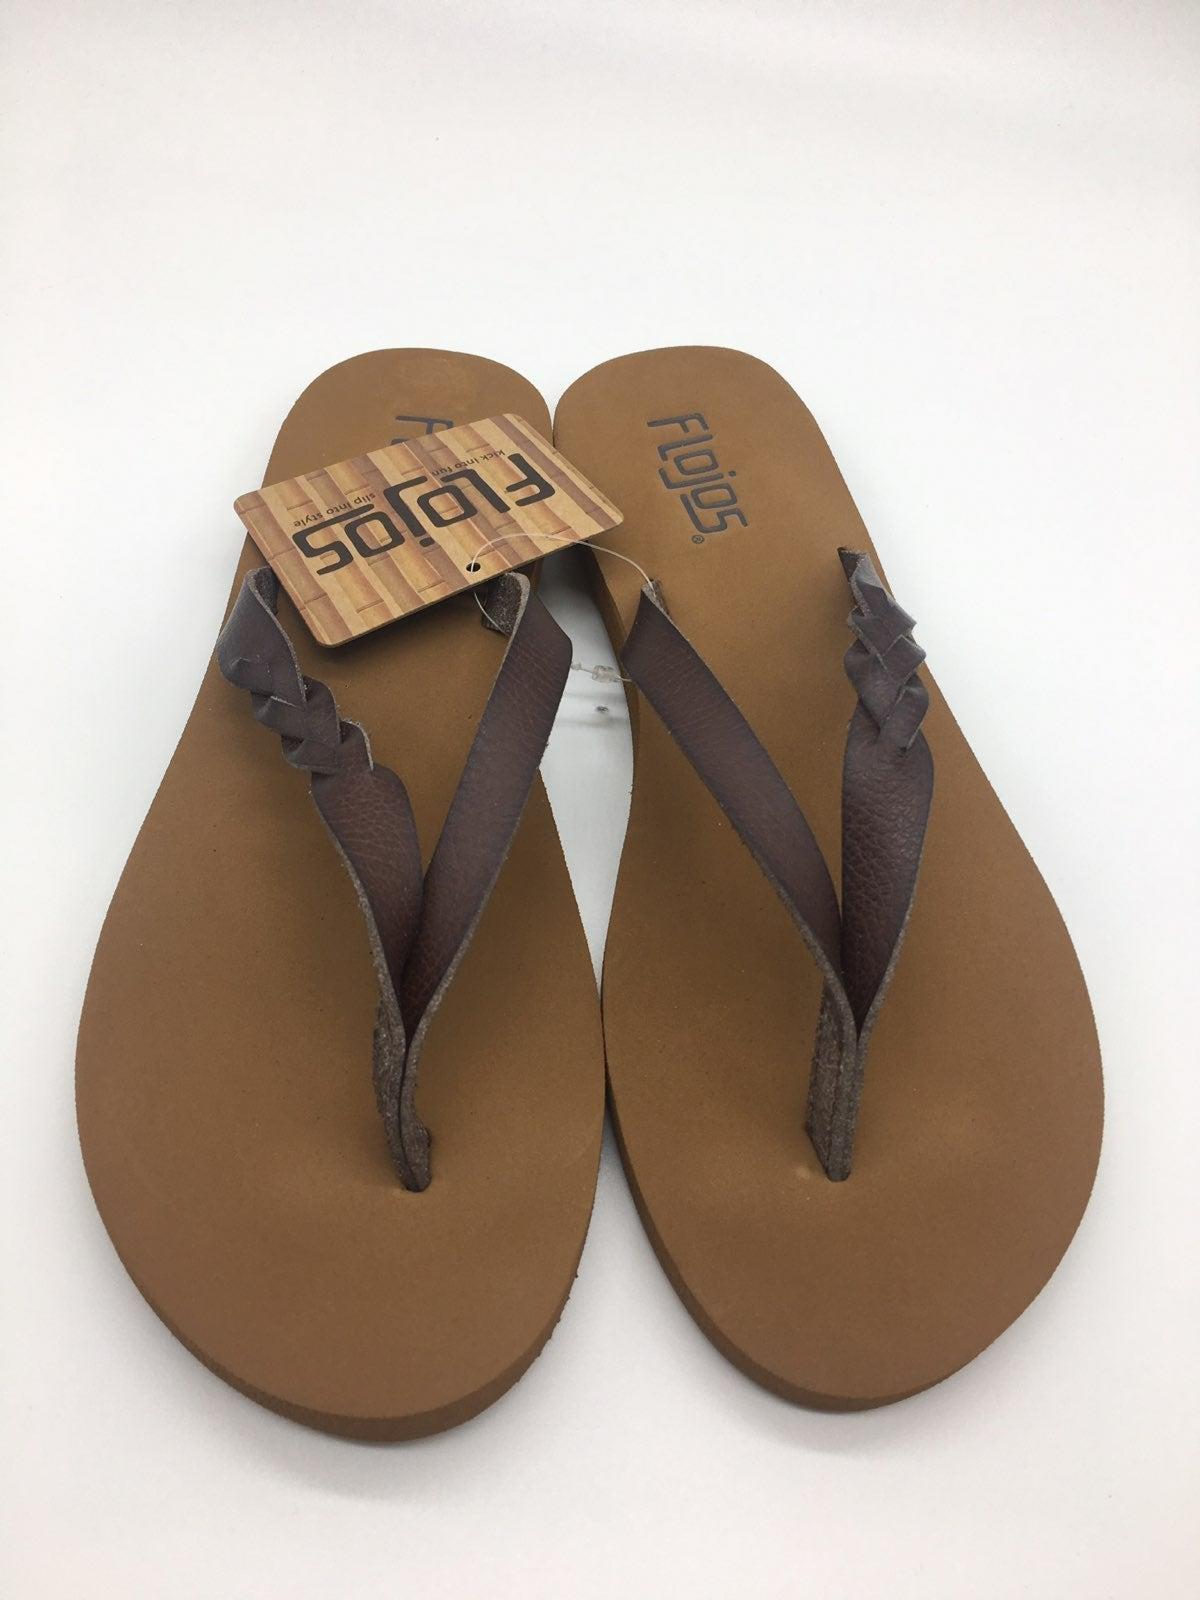 Flojos Serenity Flip Flops Brown Sz 6